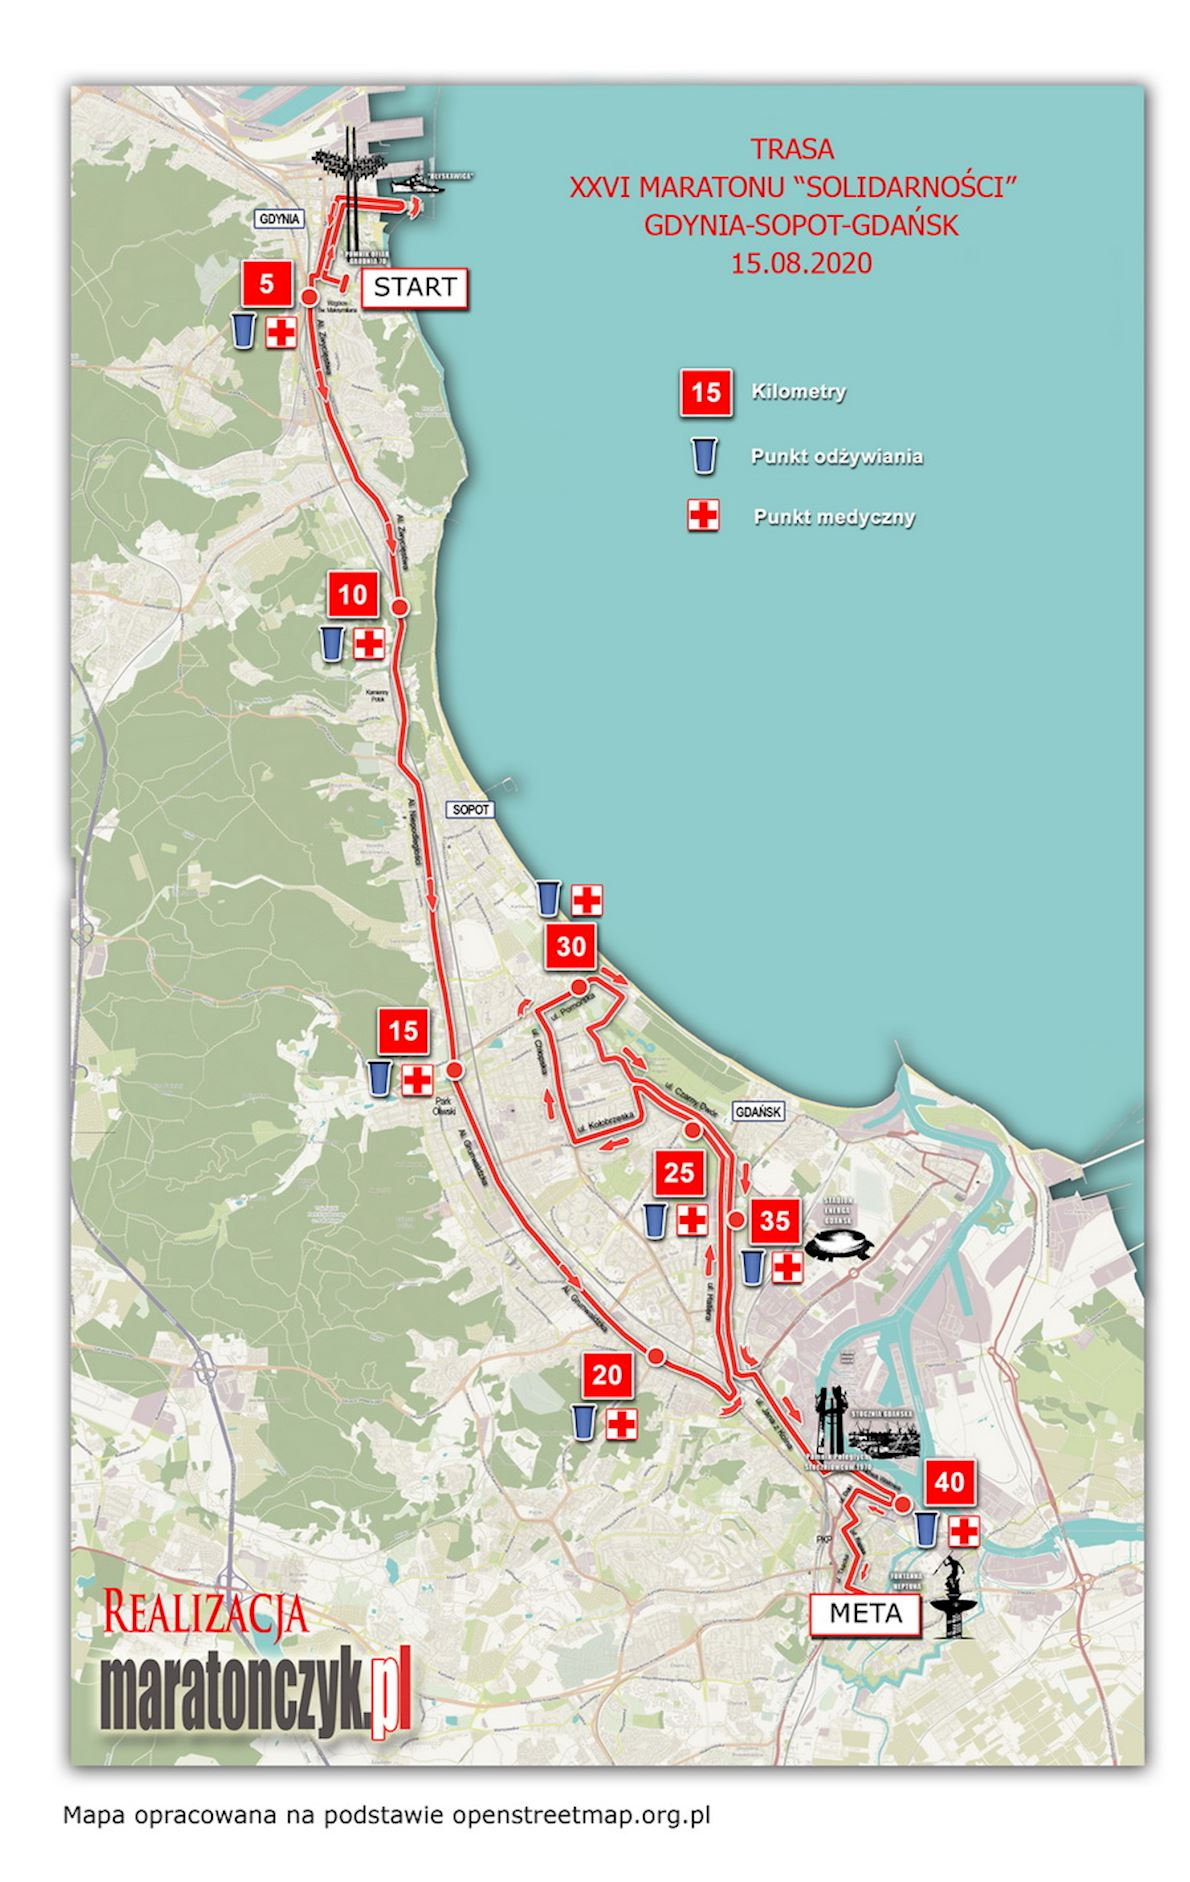 Solidarity Marathon Gdansk 路线图